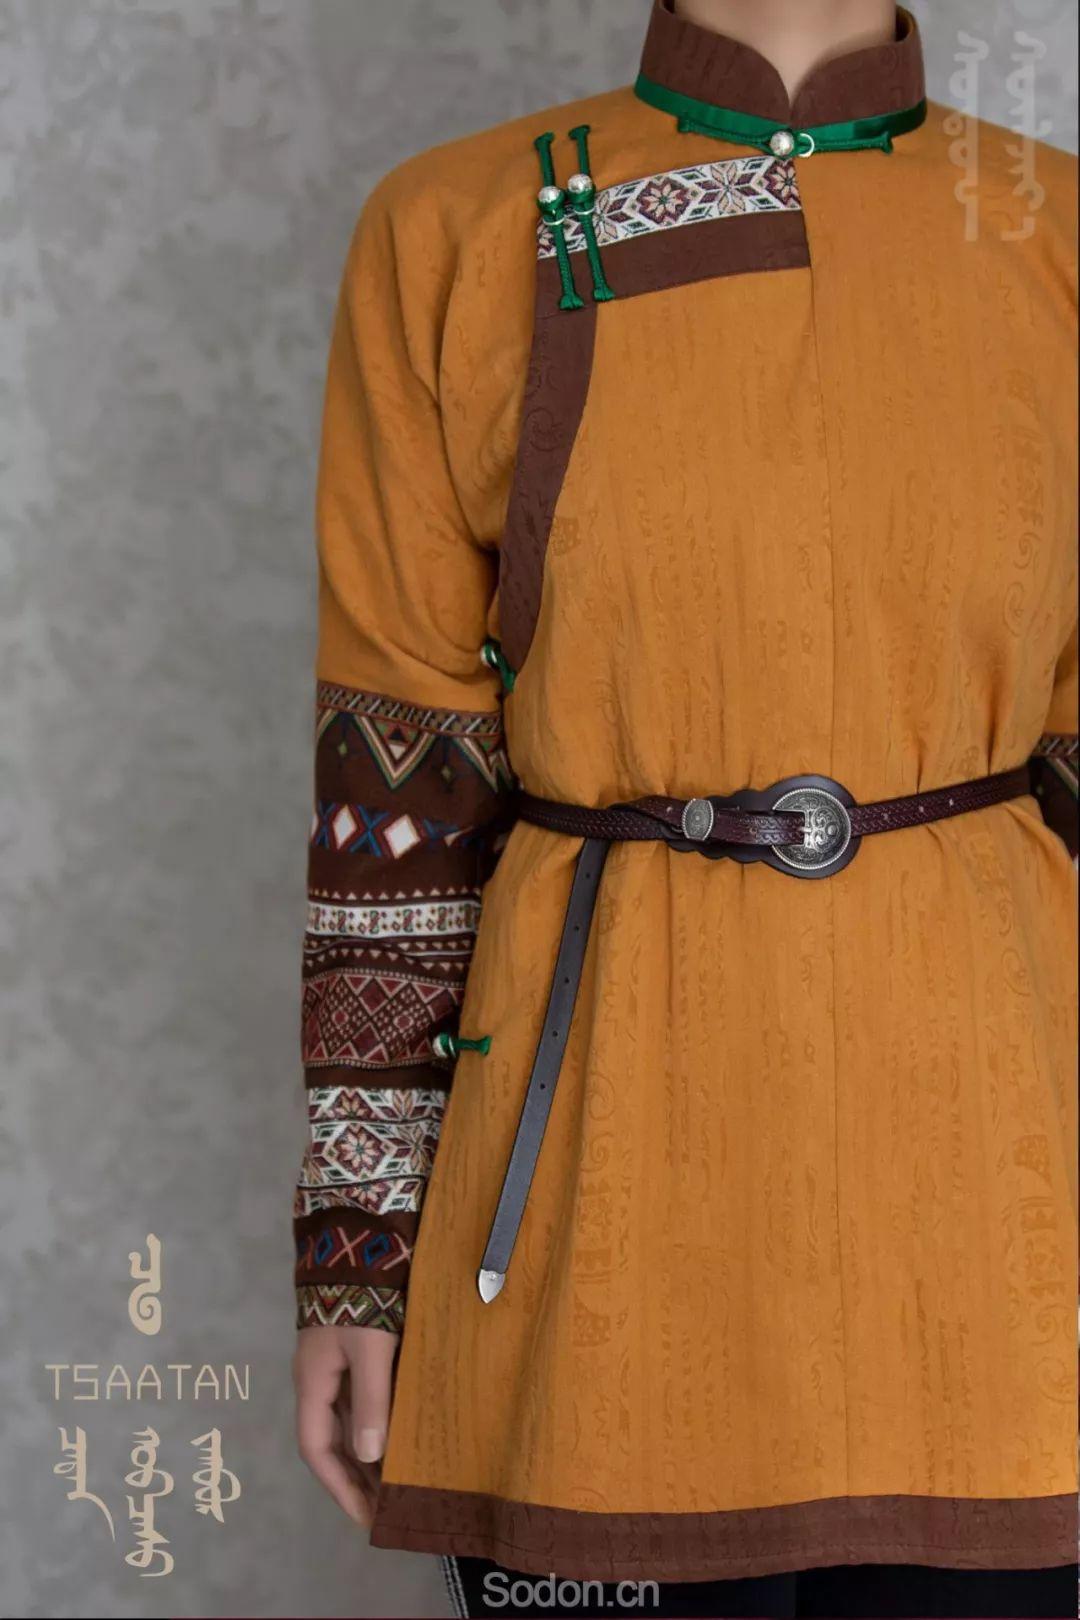 TSAATAN蒙古时装 2019夏季新款首发 第60张